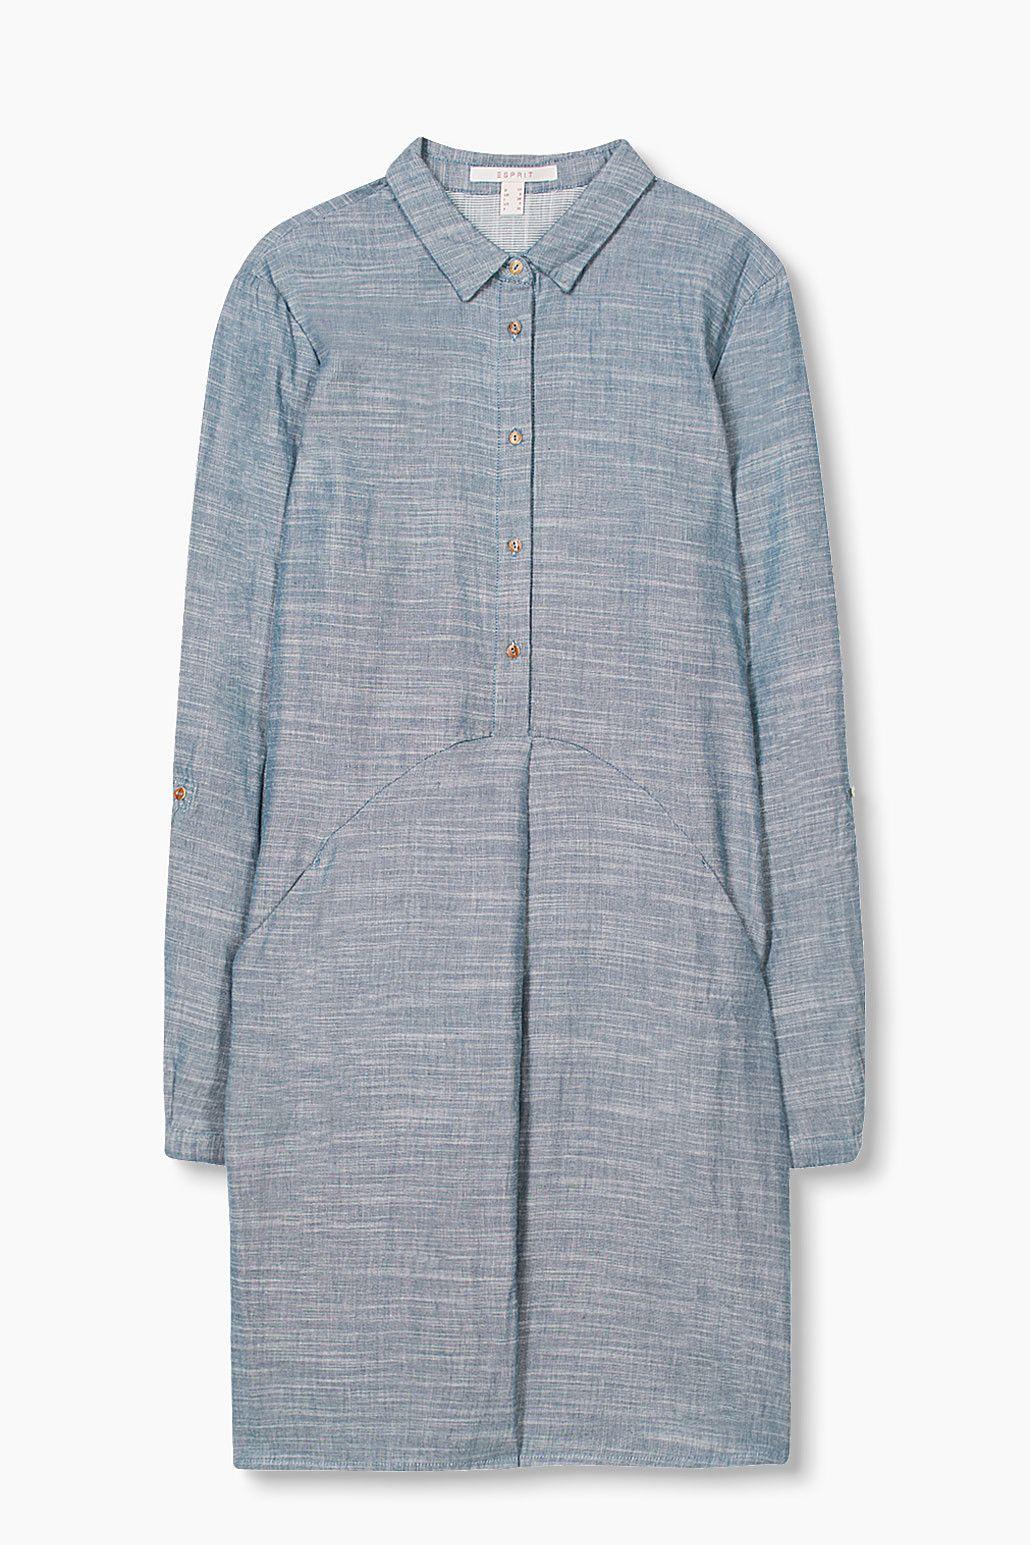 Style Pinterest Face 100 Casual Esprit Robe Coton Double qpcfY